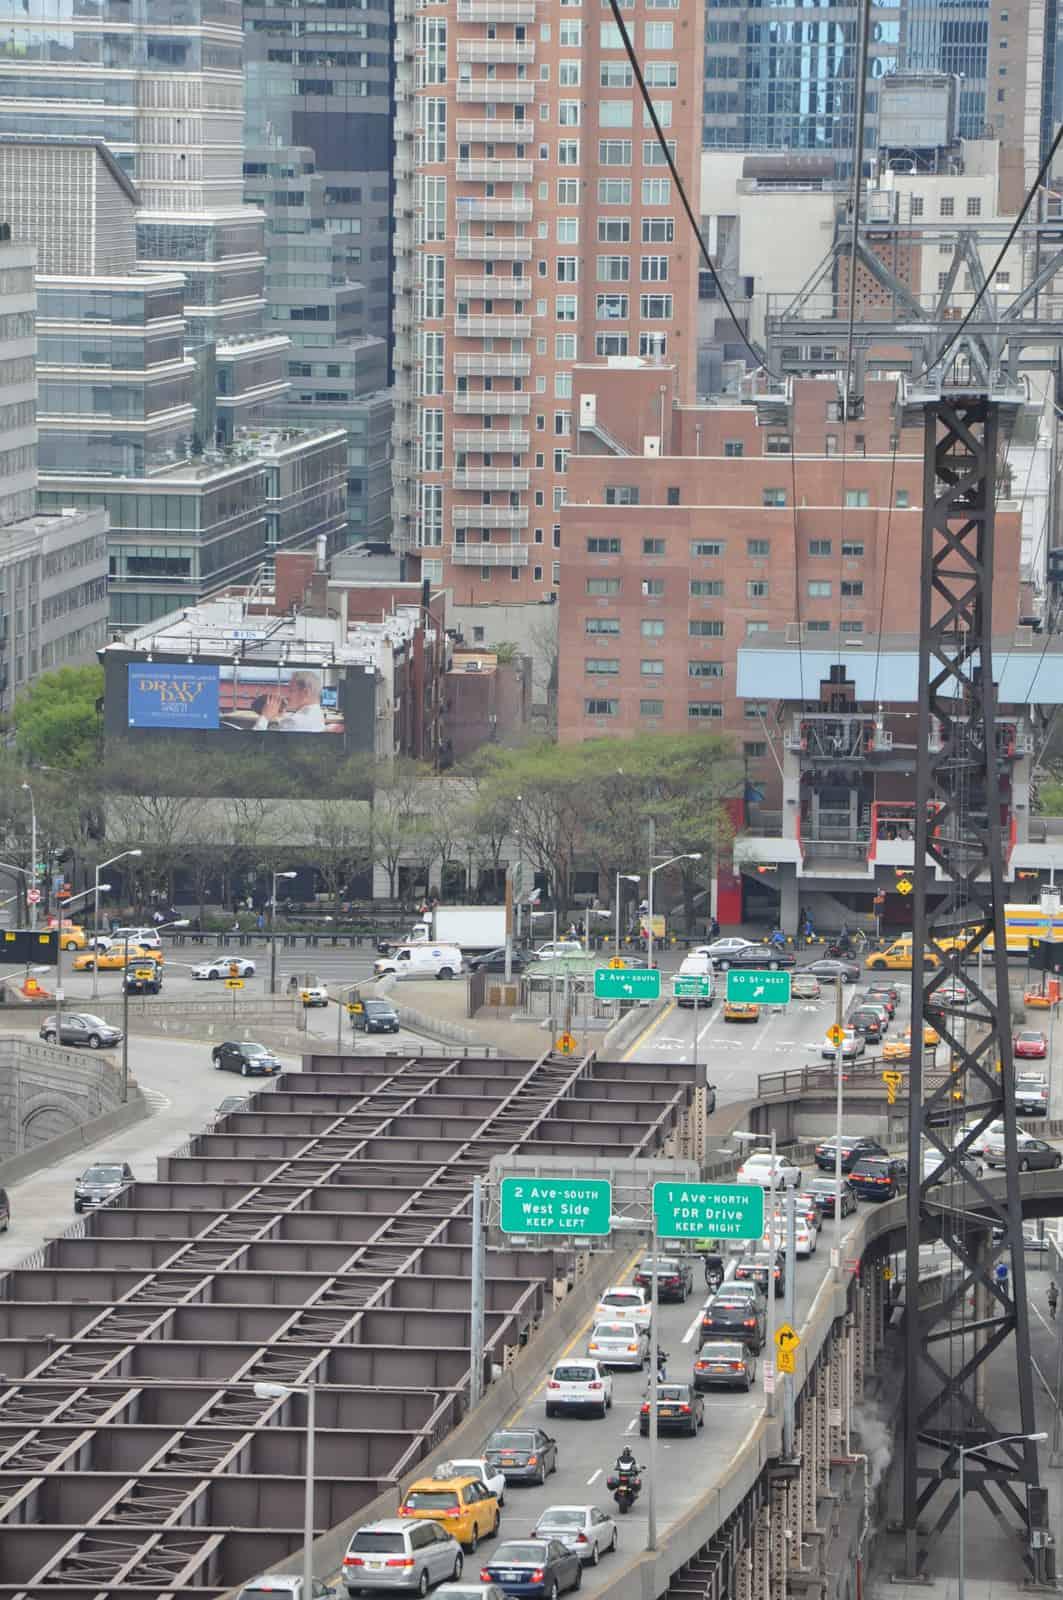 Astoria Queens, NY Private Investigator